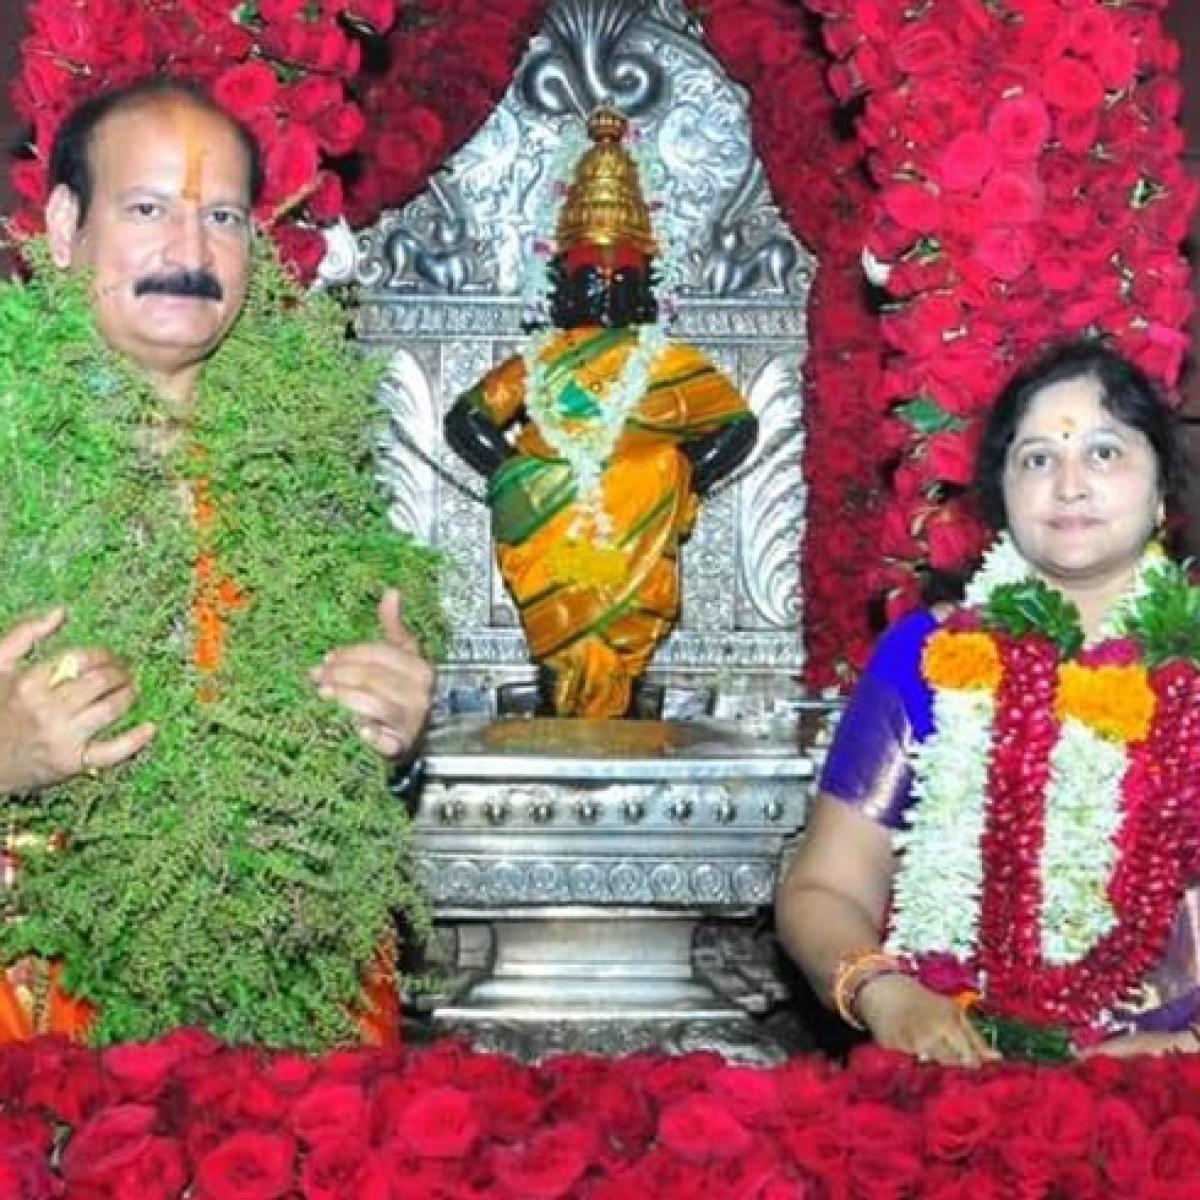 Case filed against BJP MLA for visiting temple amid coronavirus lockdown